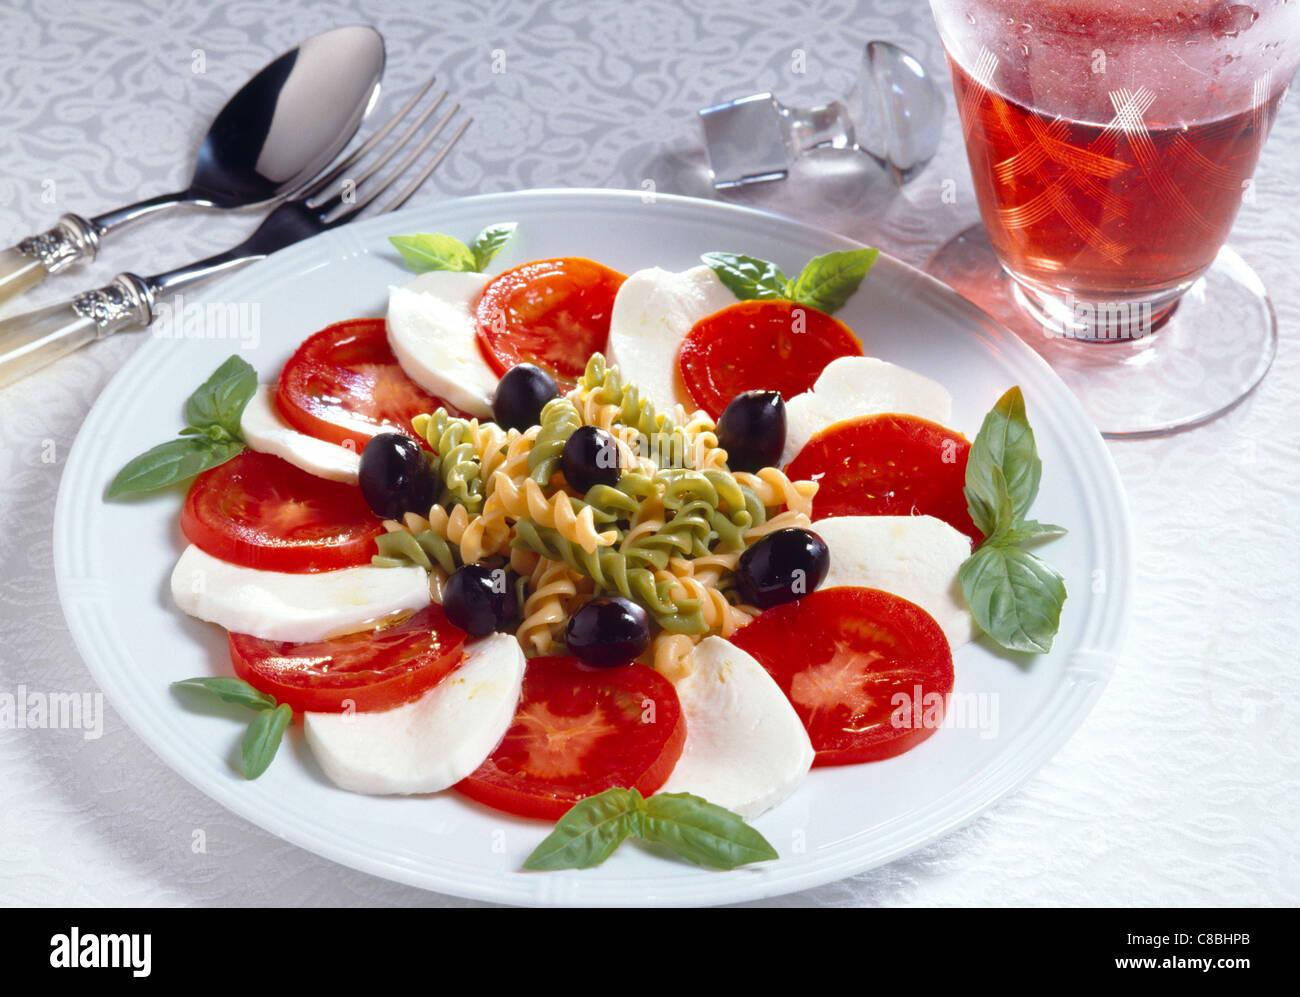 Tomatensalat mit Mozzarella Stockbild